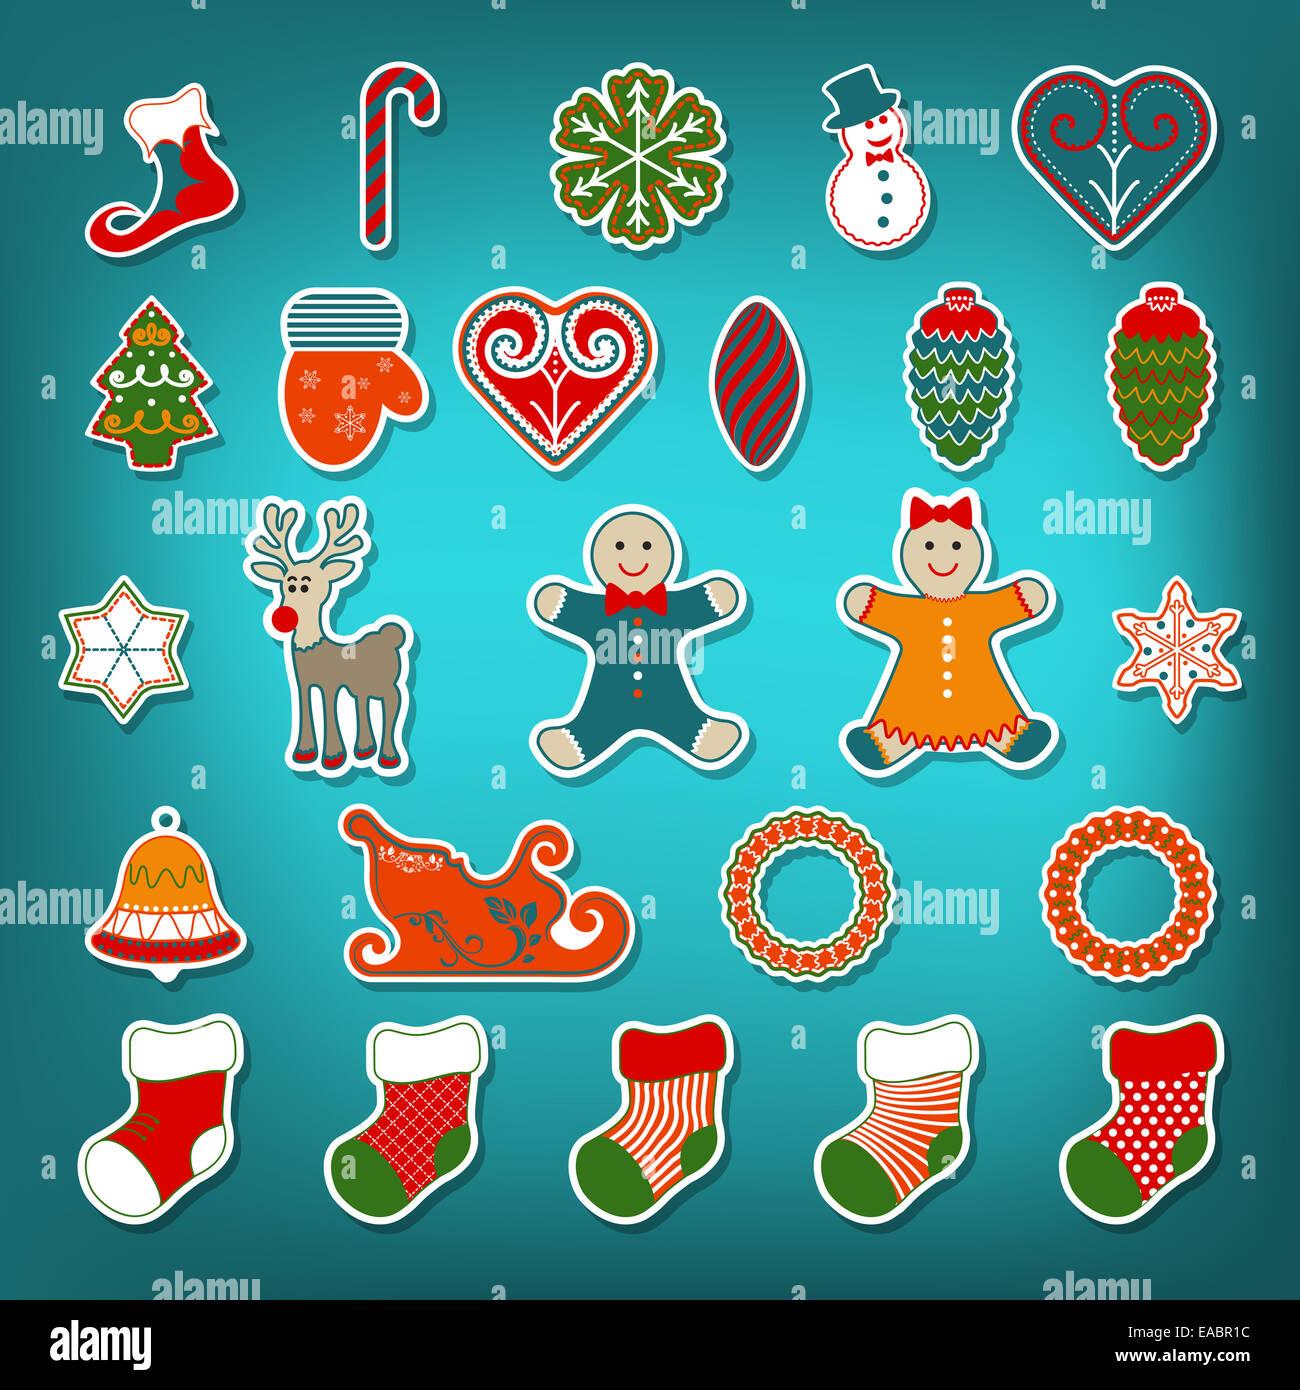 Christmas sticker set - Stock Image